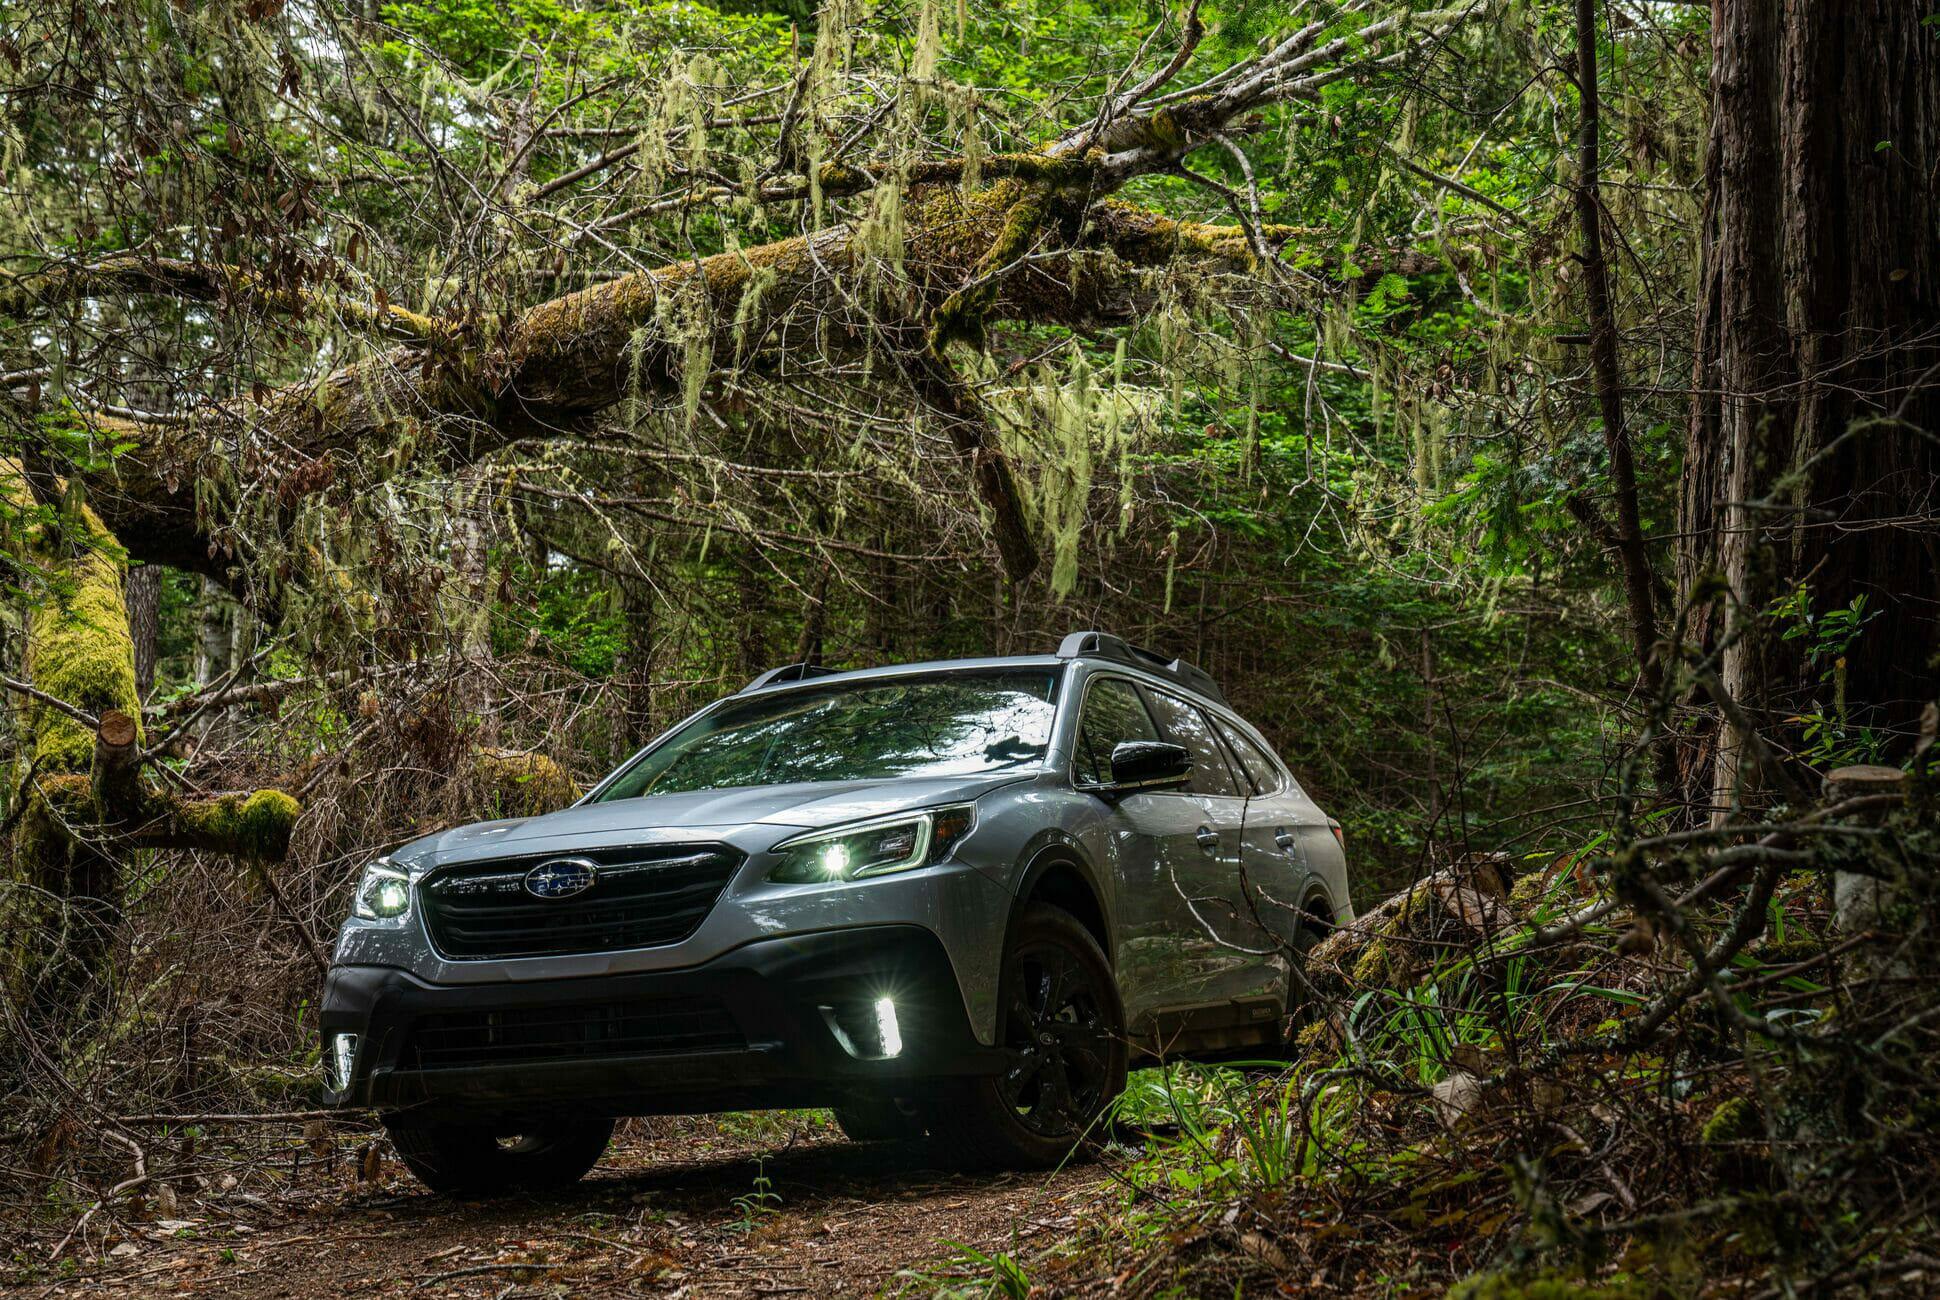 2020-Subaru-Outback-Review-gear-patrol-slide-2